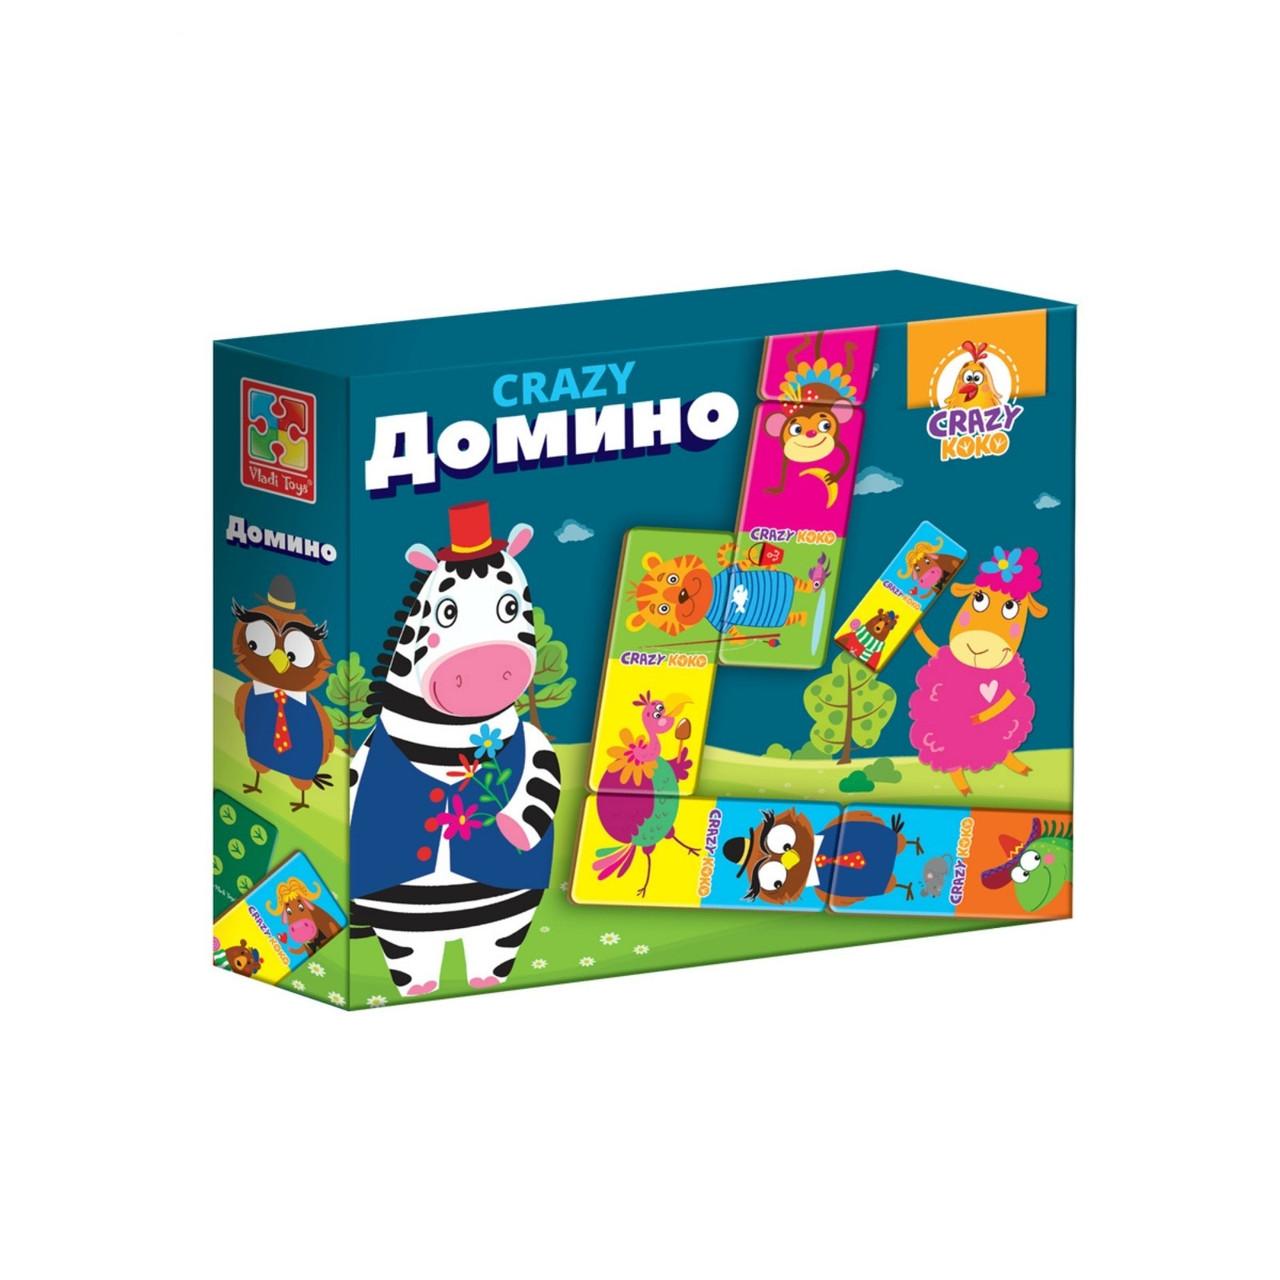 Игра Vladi Toys Домино. Crazy KOKO (Рус) (VT8055-04)